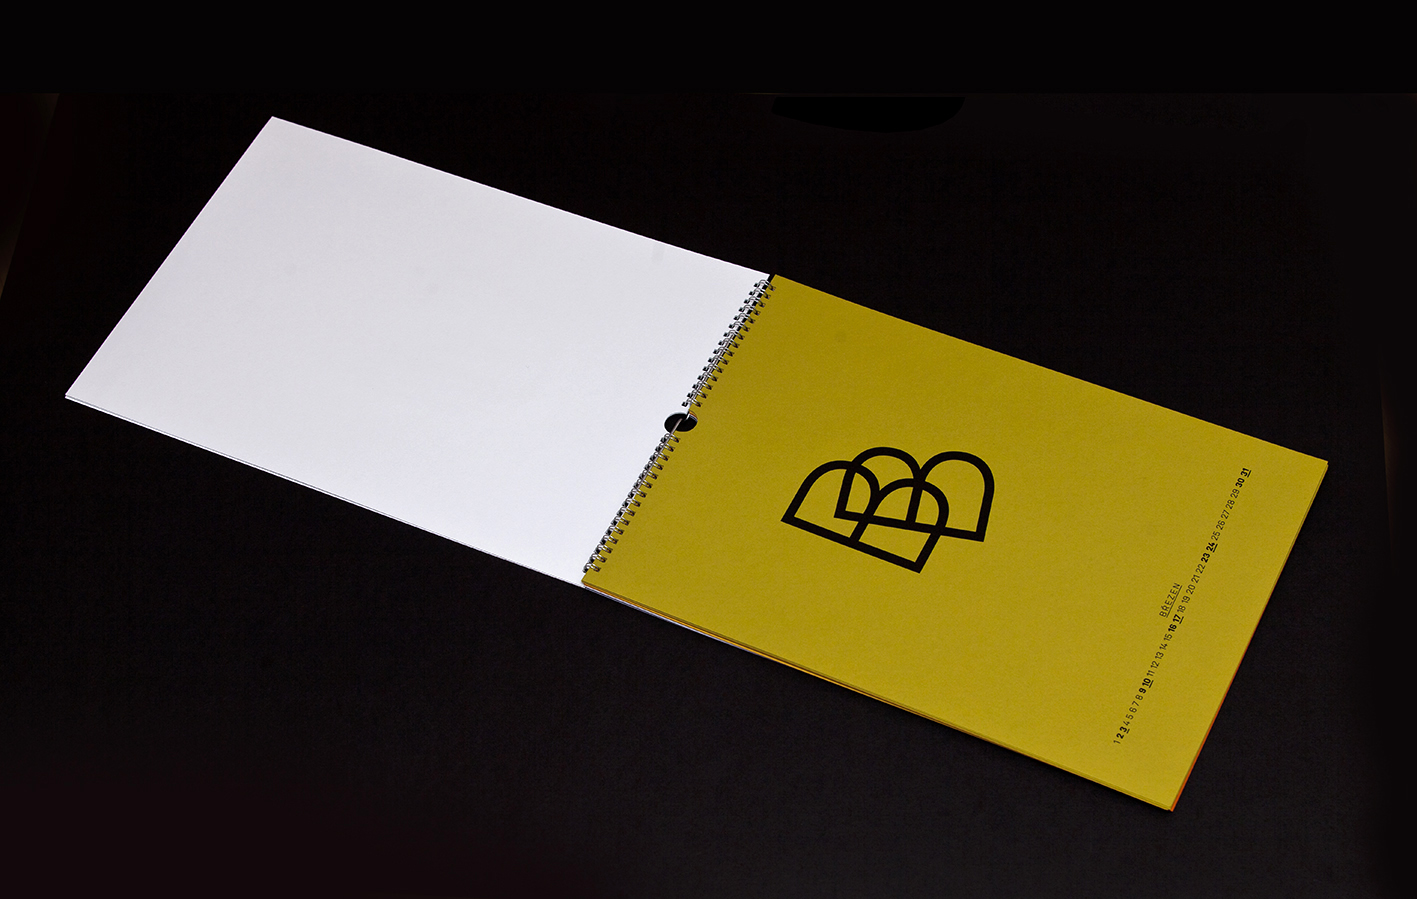 Typografie Šimon Brzobohatý<br>sítotisk Adam Lešikar a Vít Havlíček<br>papír Keaykolour (Antalis)